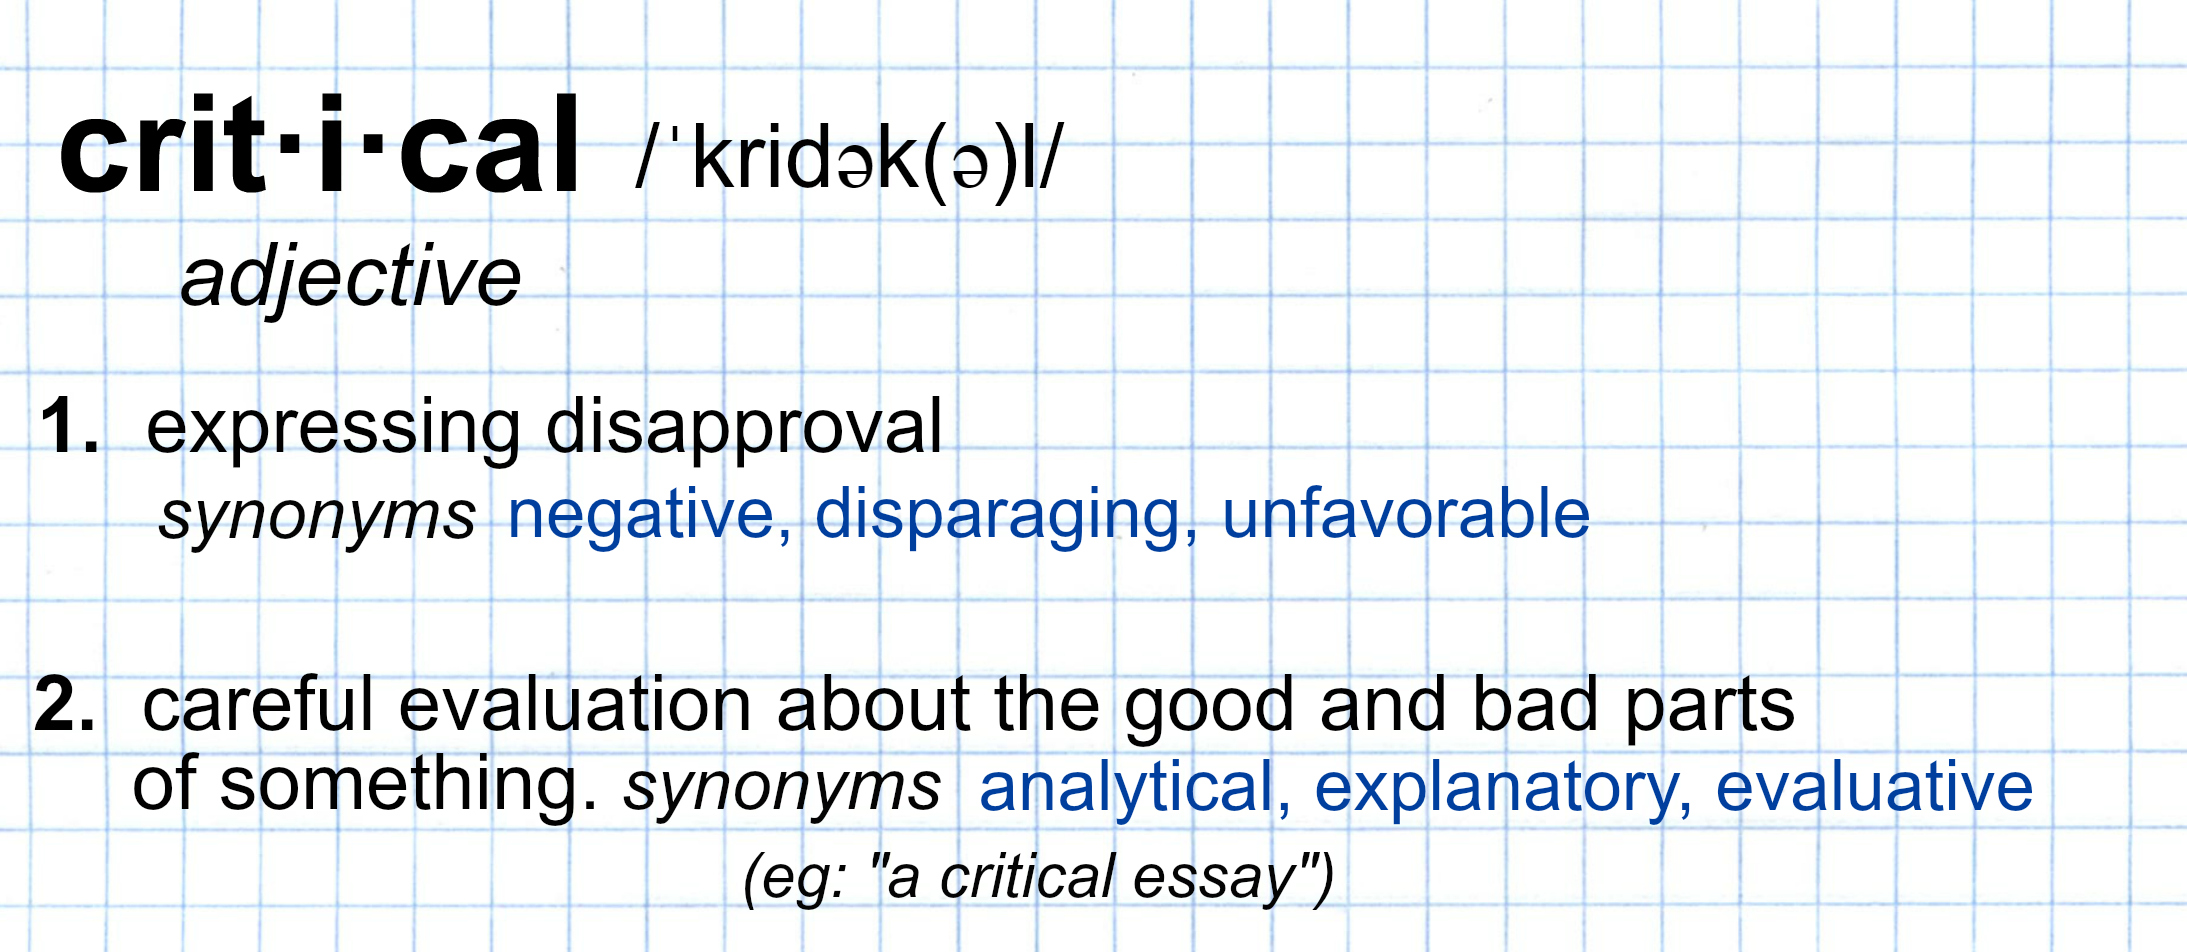 eastfallslocal-definition-of-critical-again-essay